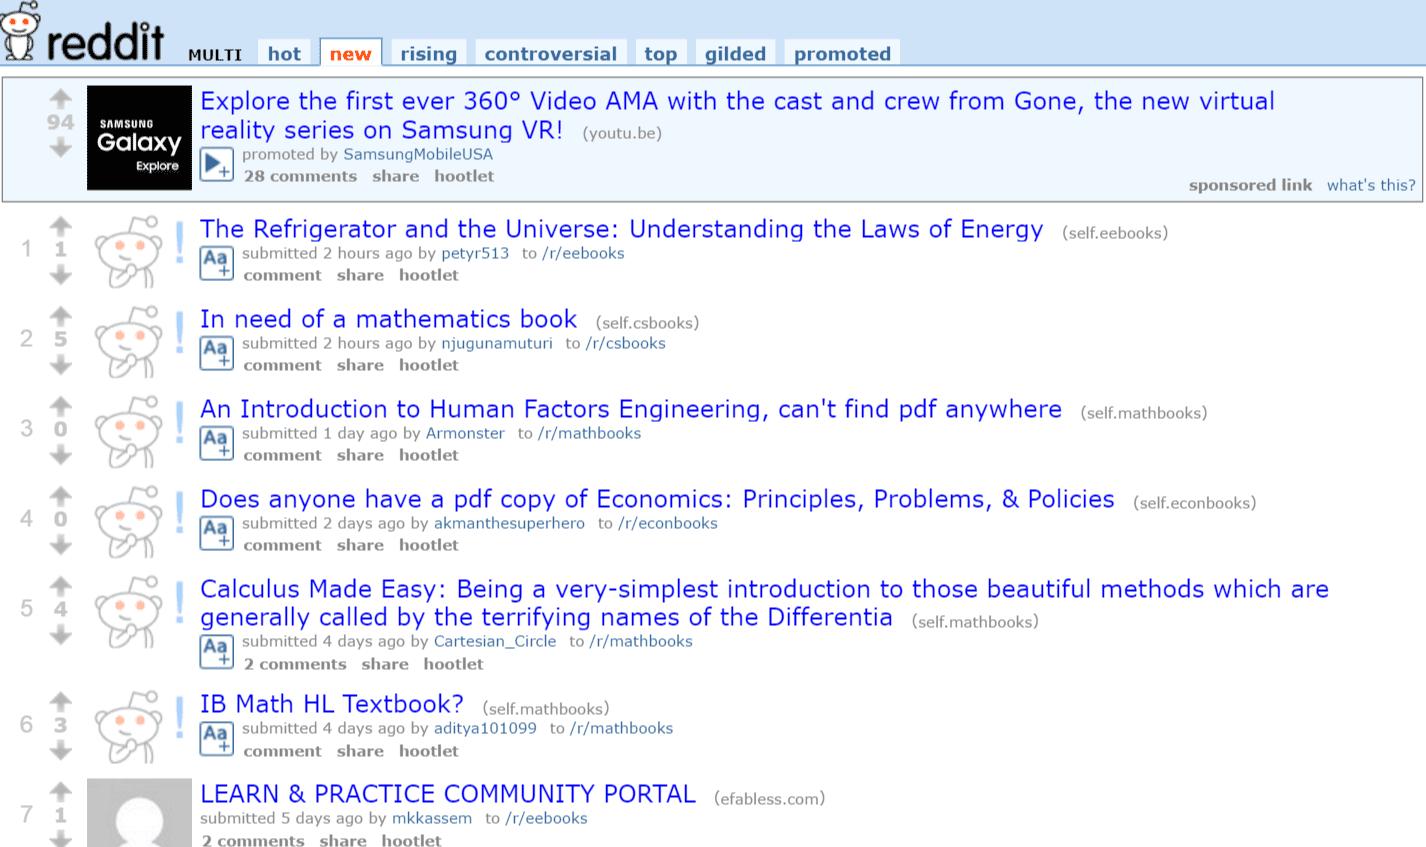 Ways To Find Free Textbooks Online - Free Printable Textbooks